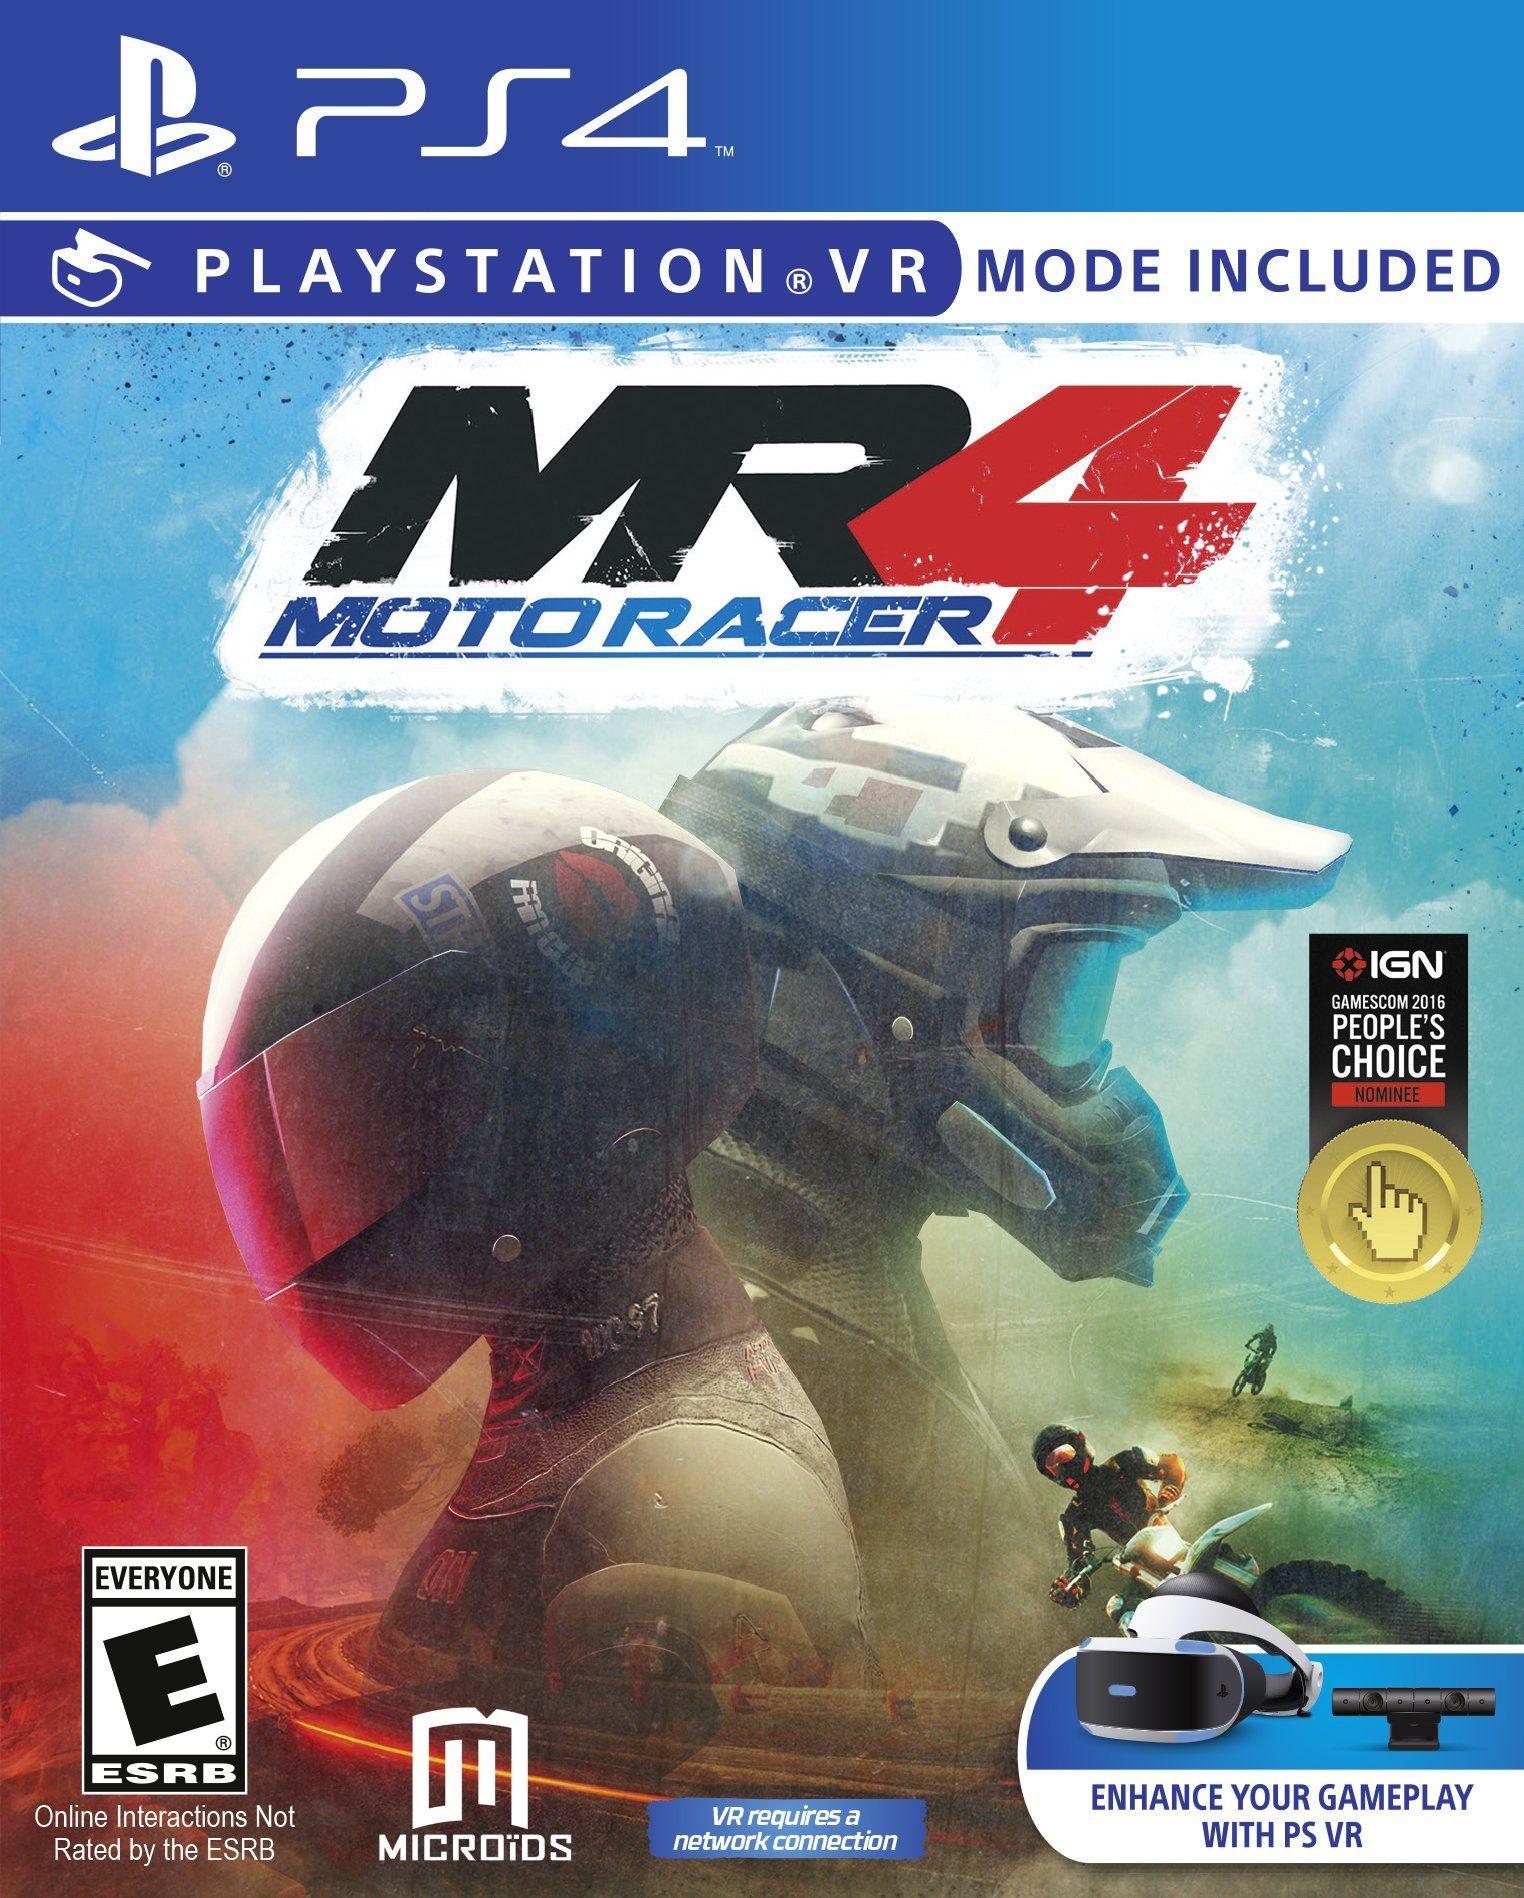 Moto Racer 4 Playstation, Playstation vr, Ps4 games